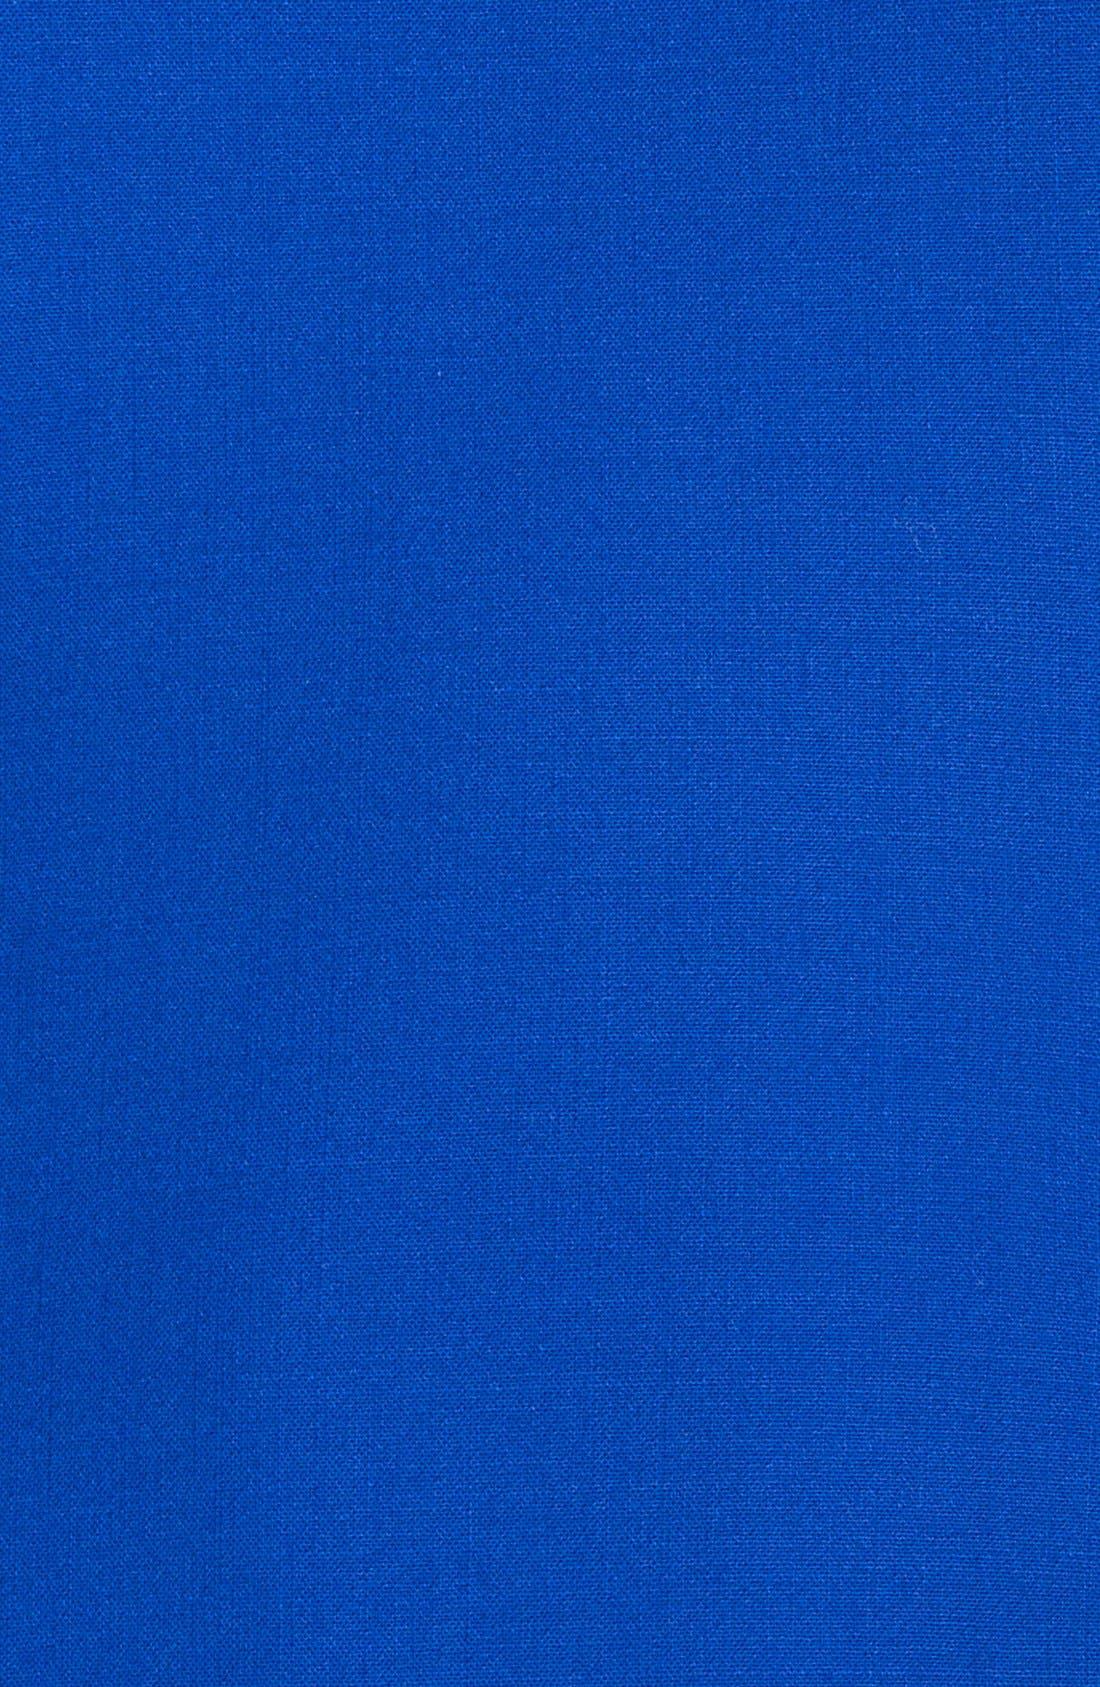 Alternate Image 3  - Emilio Pucci Back Pleat Stretch Wool Dress